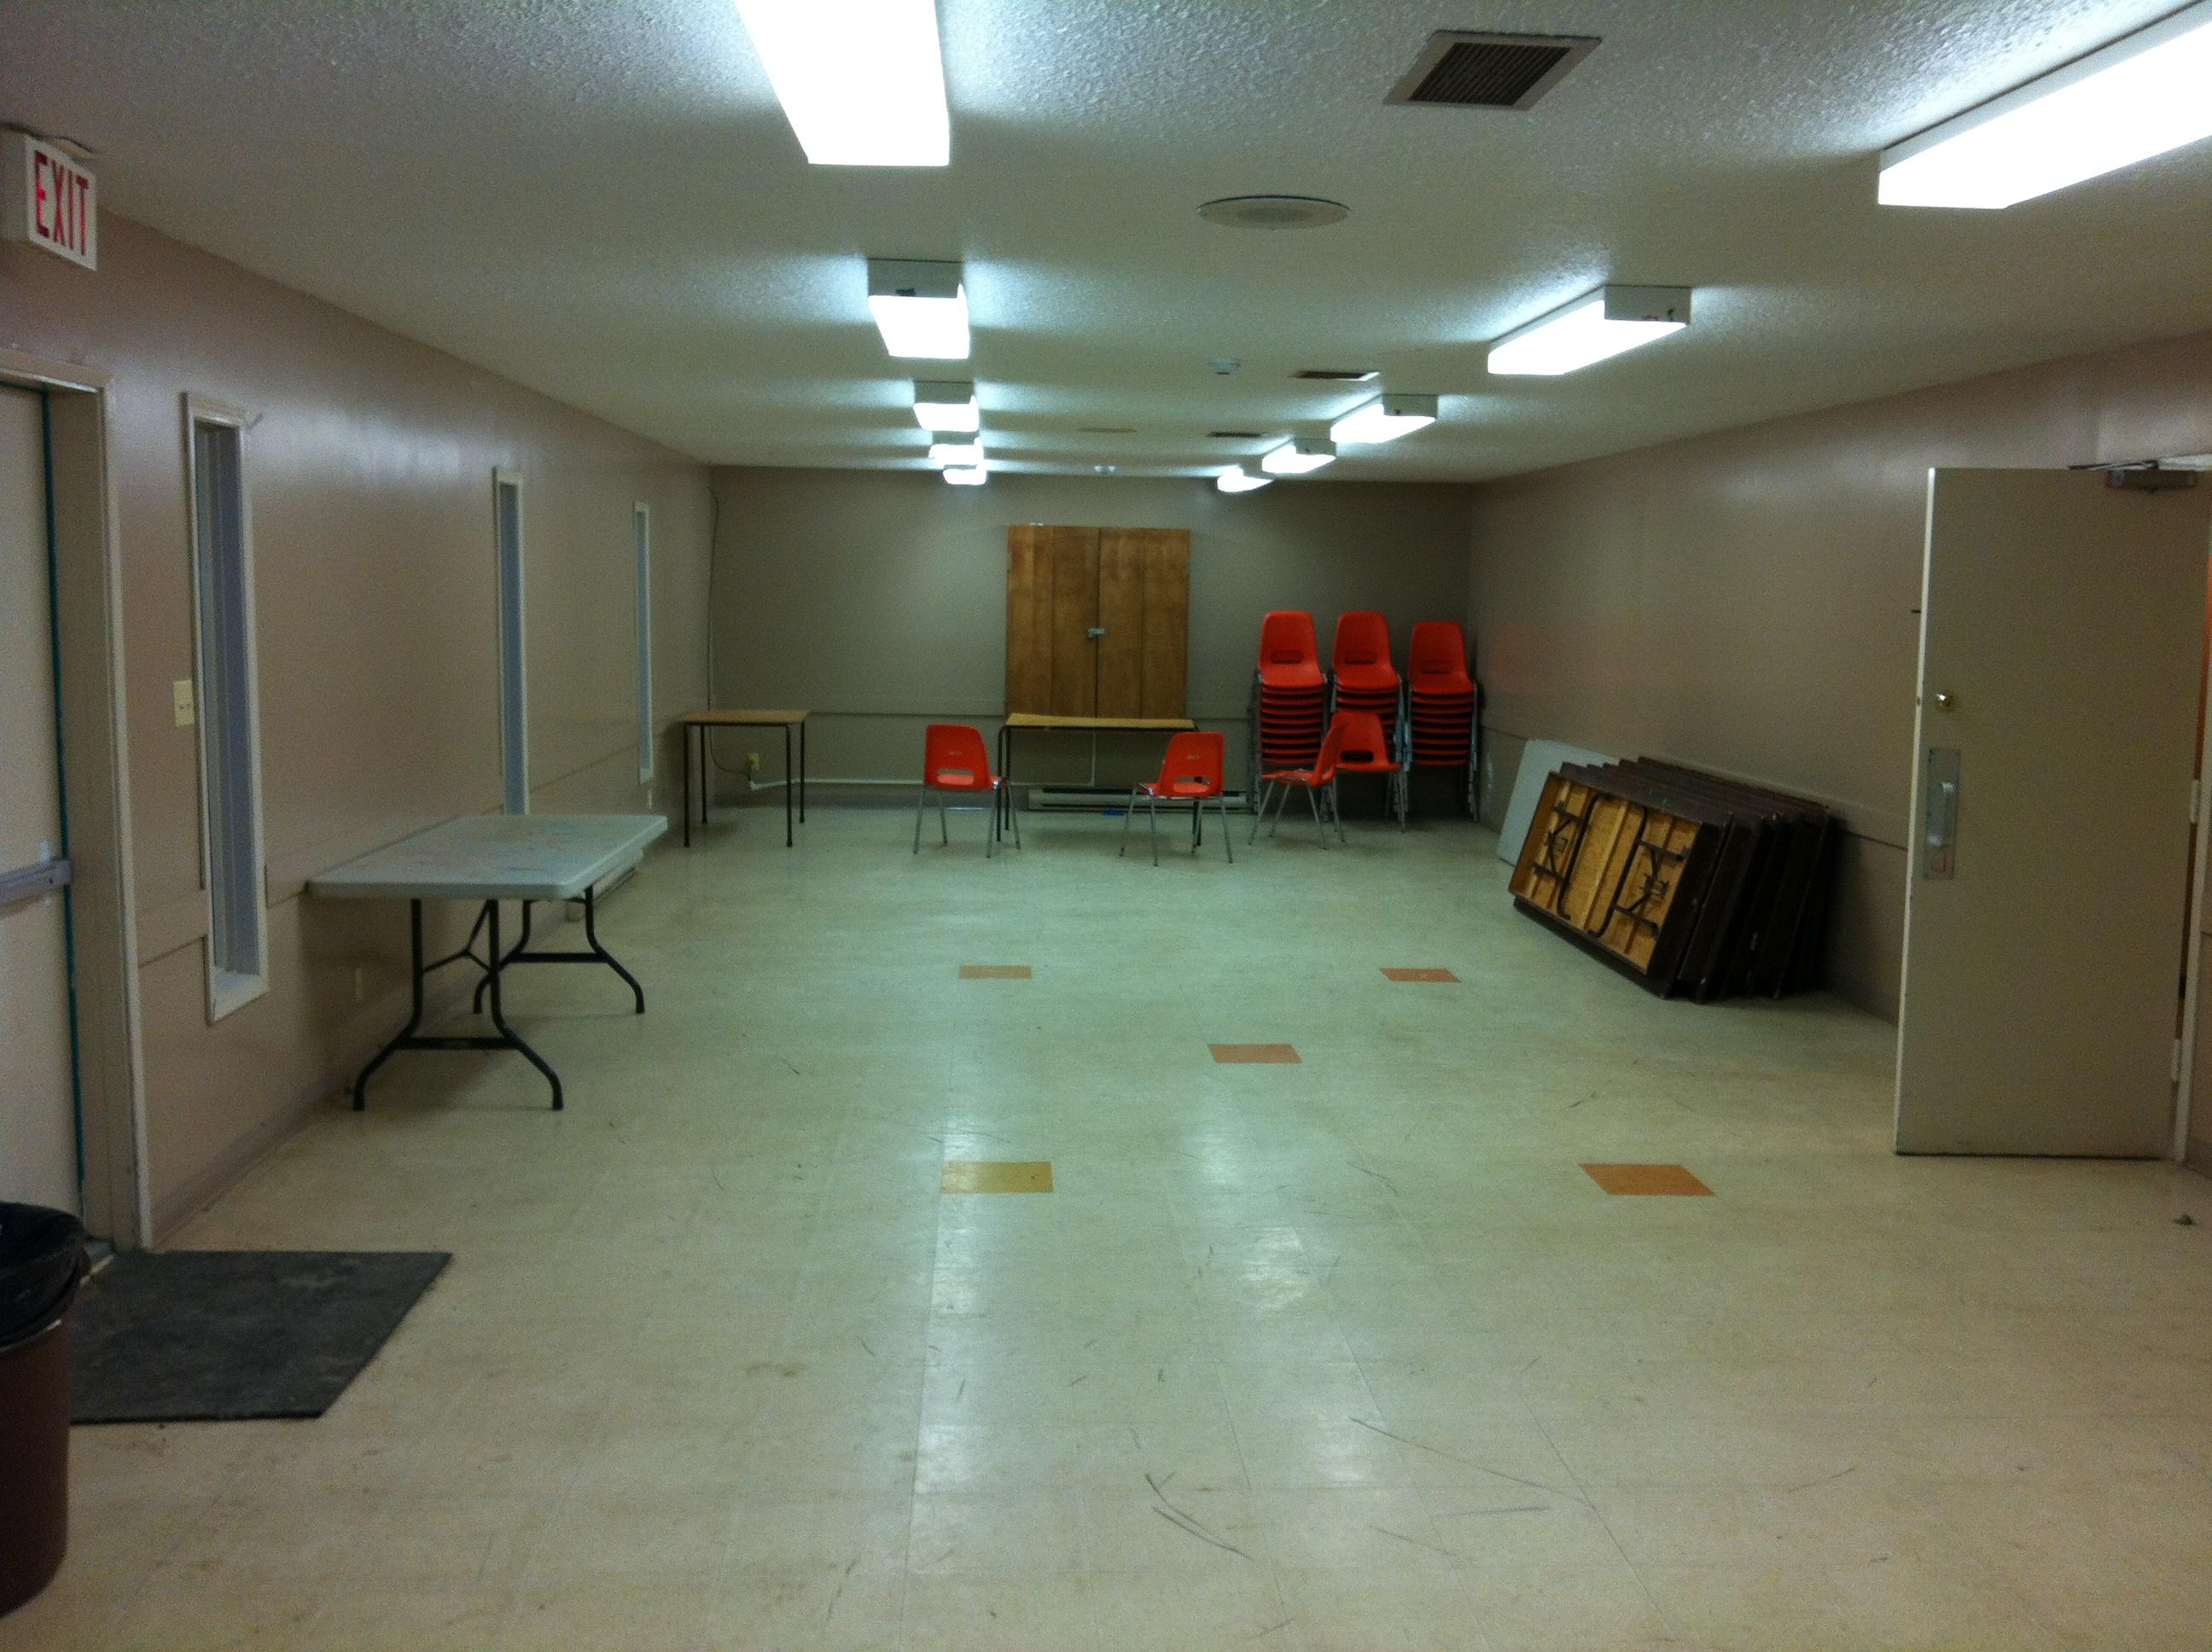 WH oldtimers rm indoor rink1 .JPG